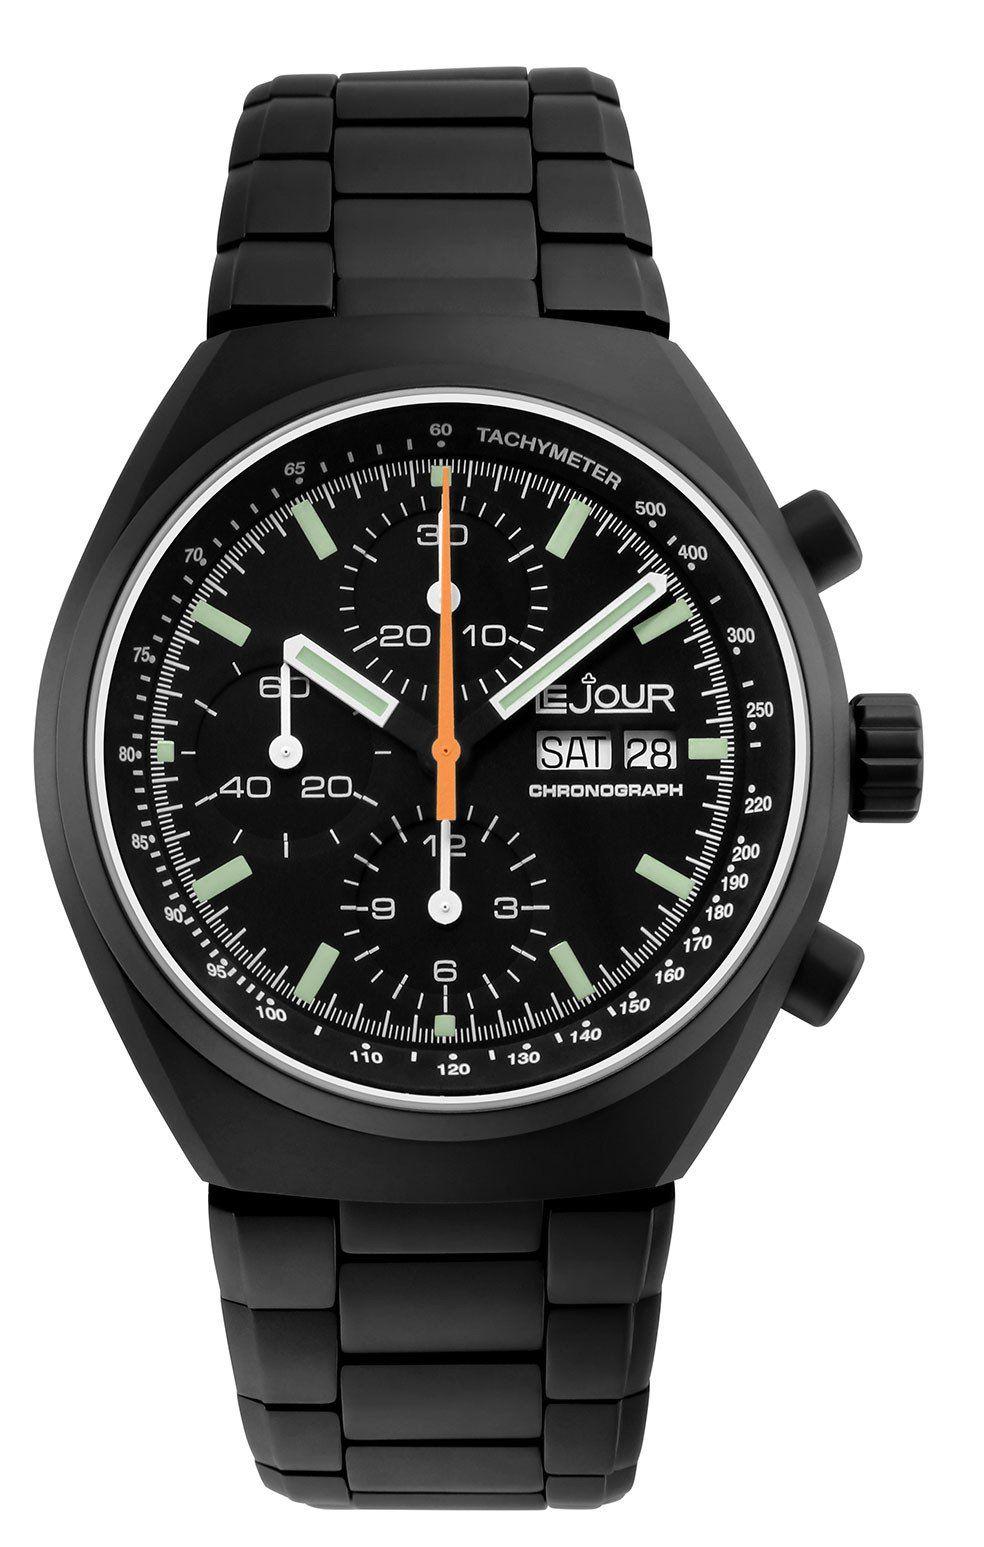 Lj Mi 004 Luxury Timepieces Greater Light Chronograph